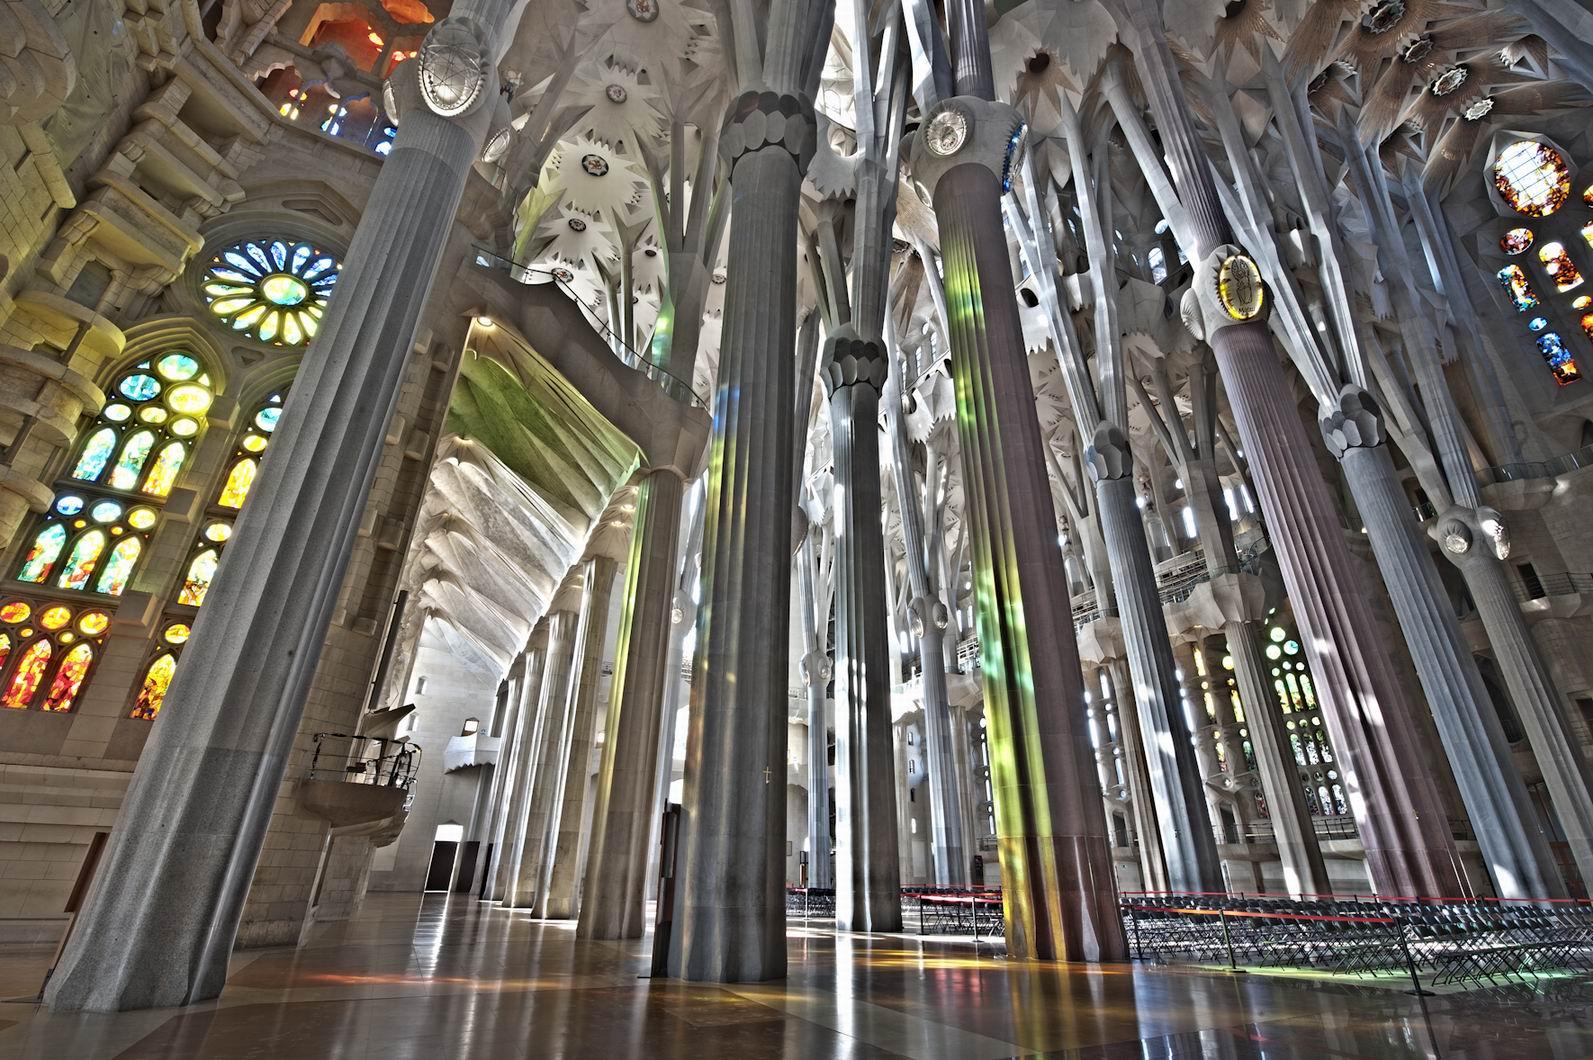 File:Sagrada Família. Interior nau.jpg - Wikimedia Commons